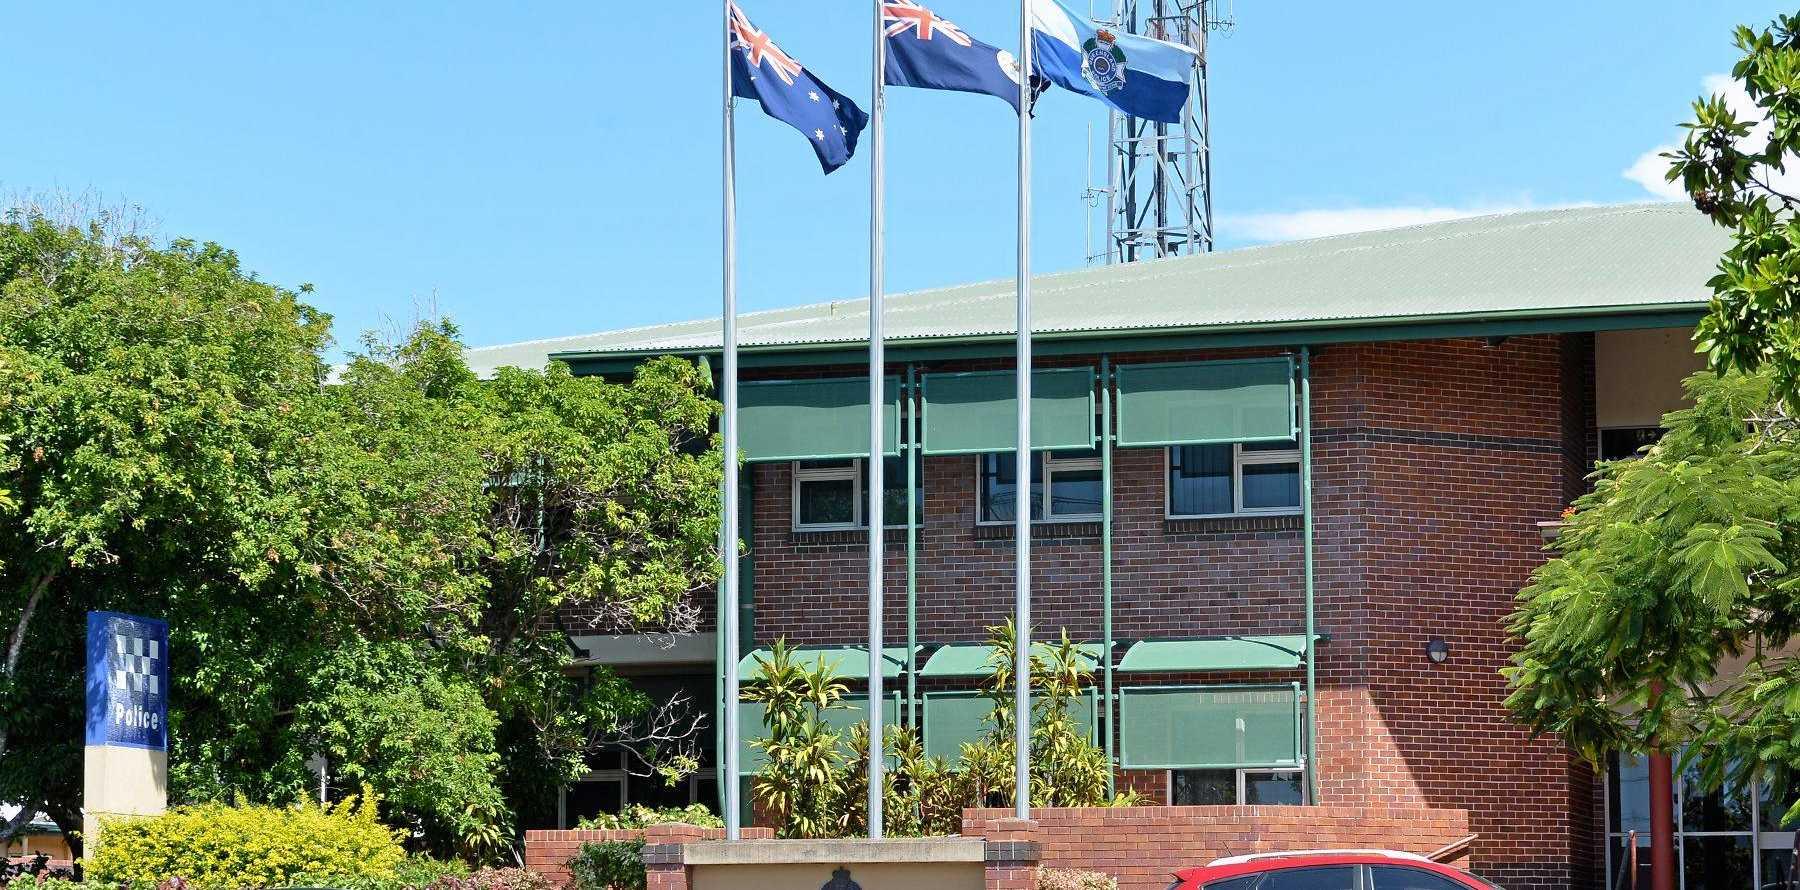 POLICE: Bundaberg Police Station.